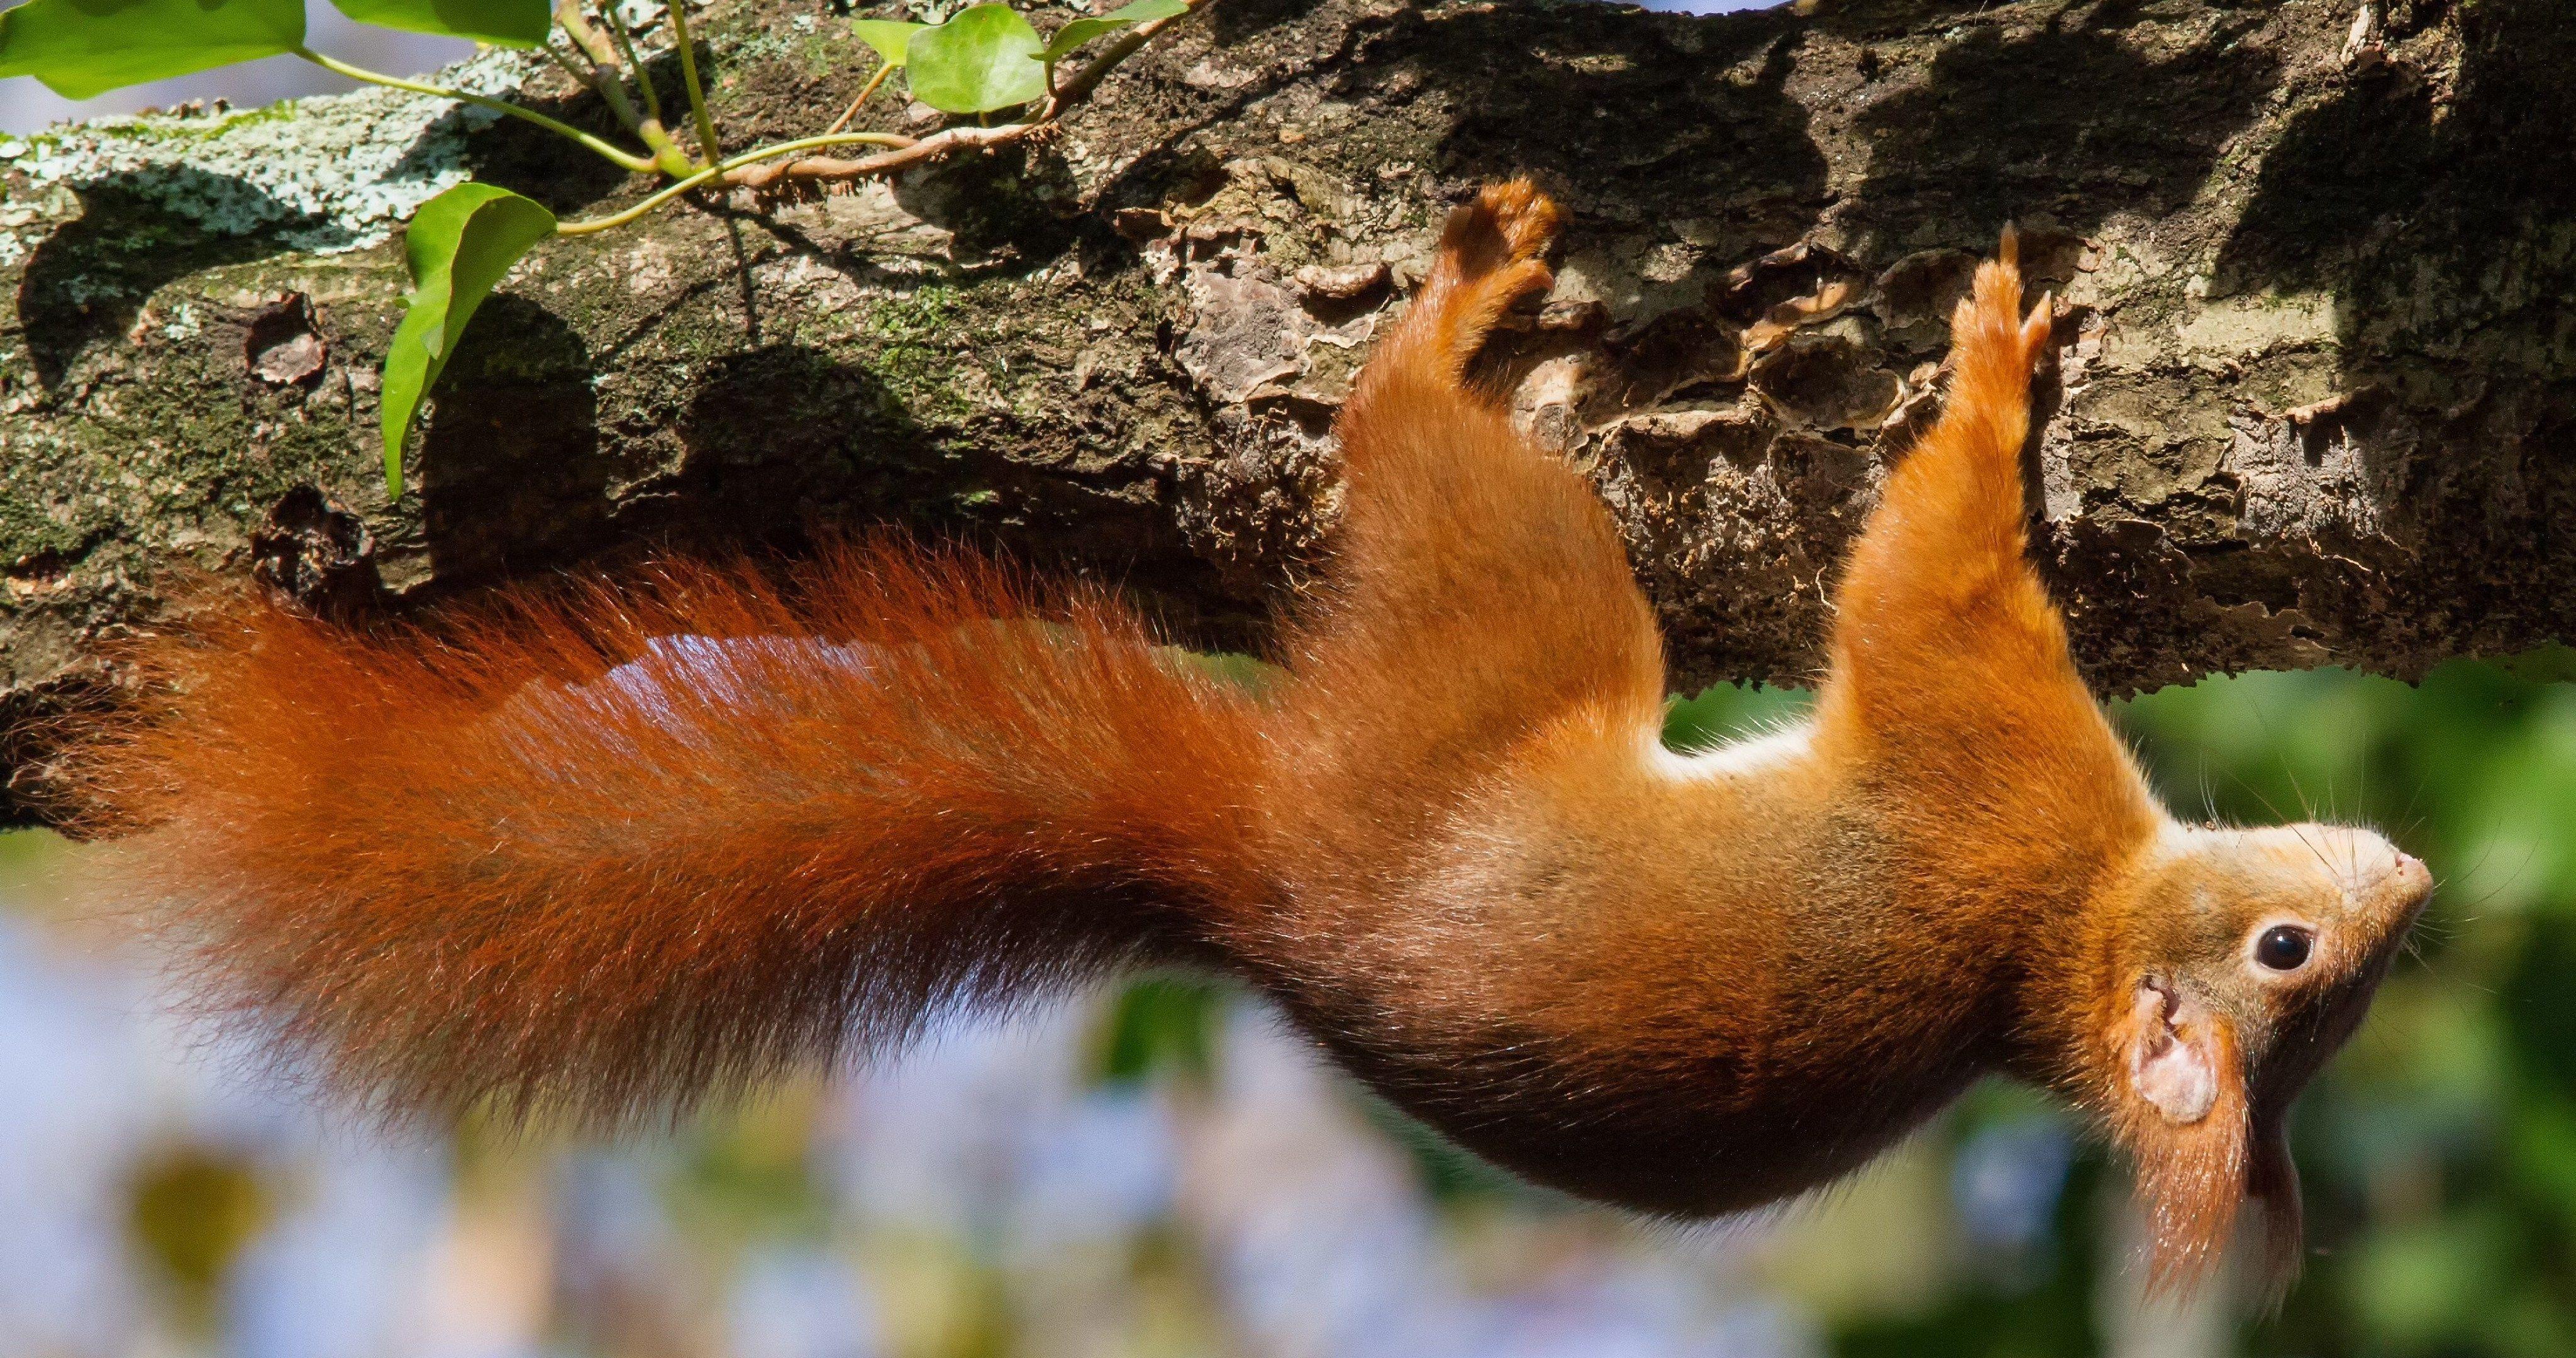 Squirrel animal on tree 4k ultra hd wallpaper ololoshenka - Ultra hd animal wallpapers ...